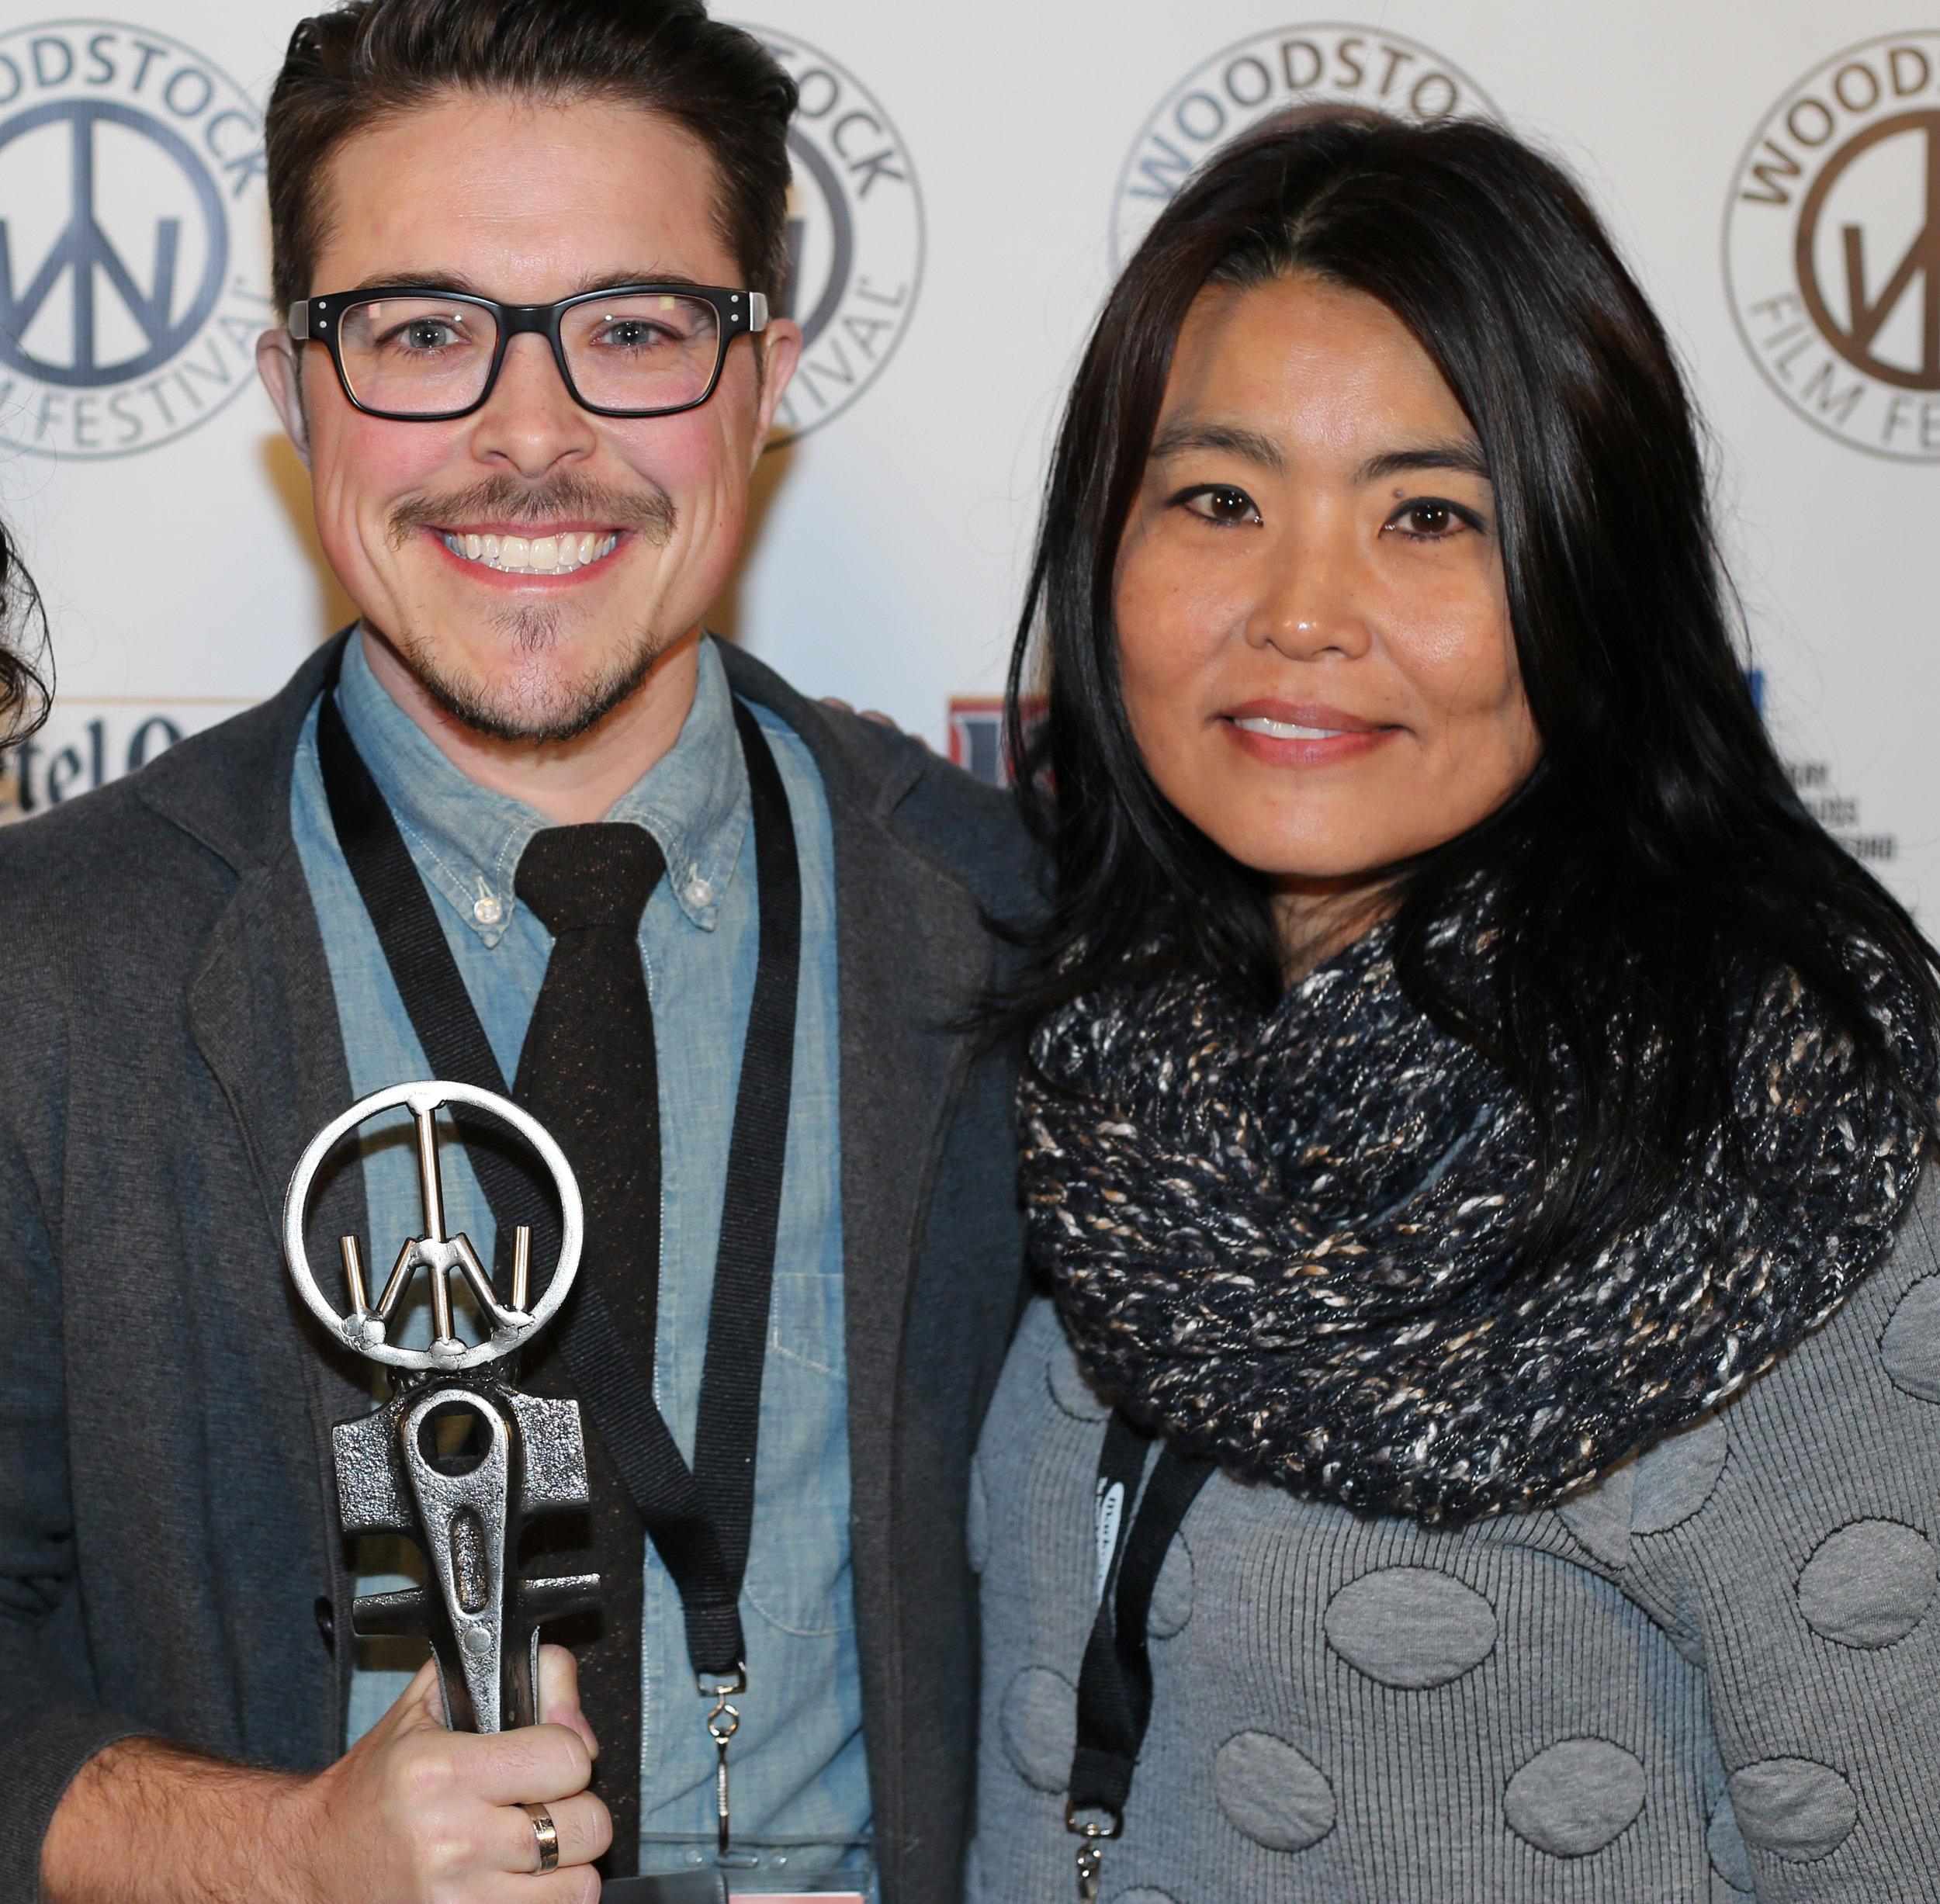 Mako Kamitsuna  (R) with Documentary Editing Award Winner  Kyle Ranson-Walsh  at the 2016 Woodstock Film Festival